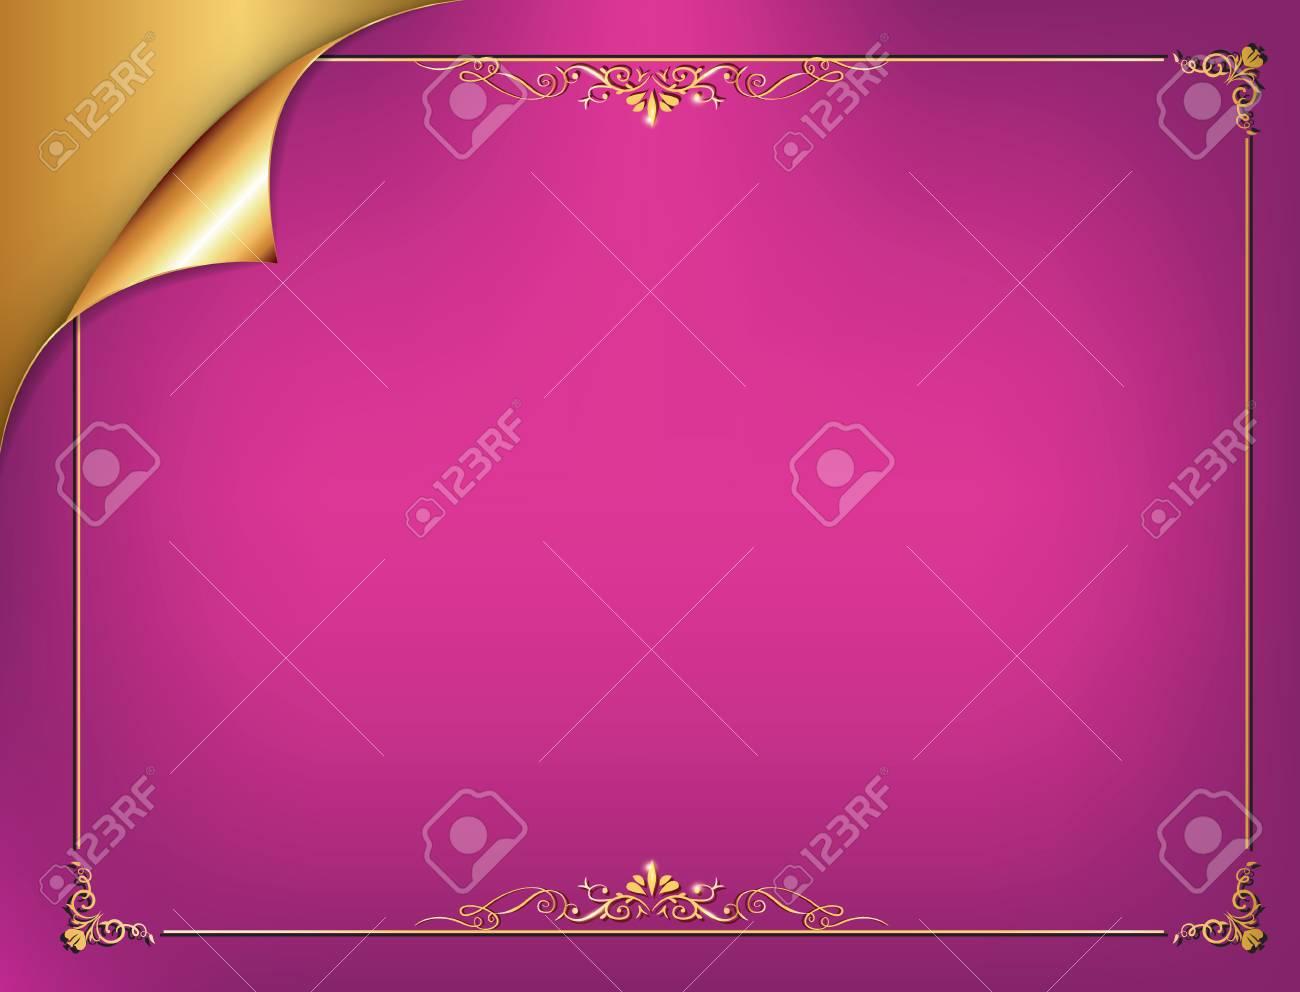 Golden Purple Elegant Background For Any Occasion Birthdays Wedding Invitations Celebration Postcards